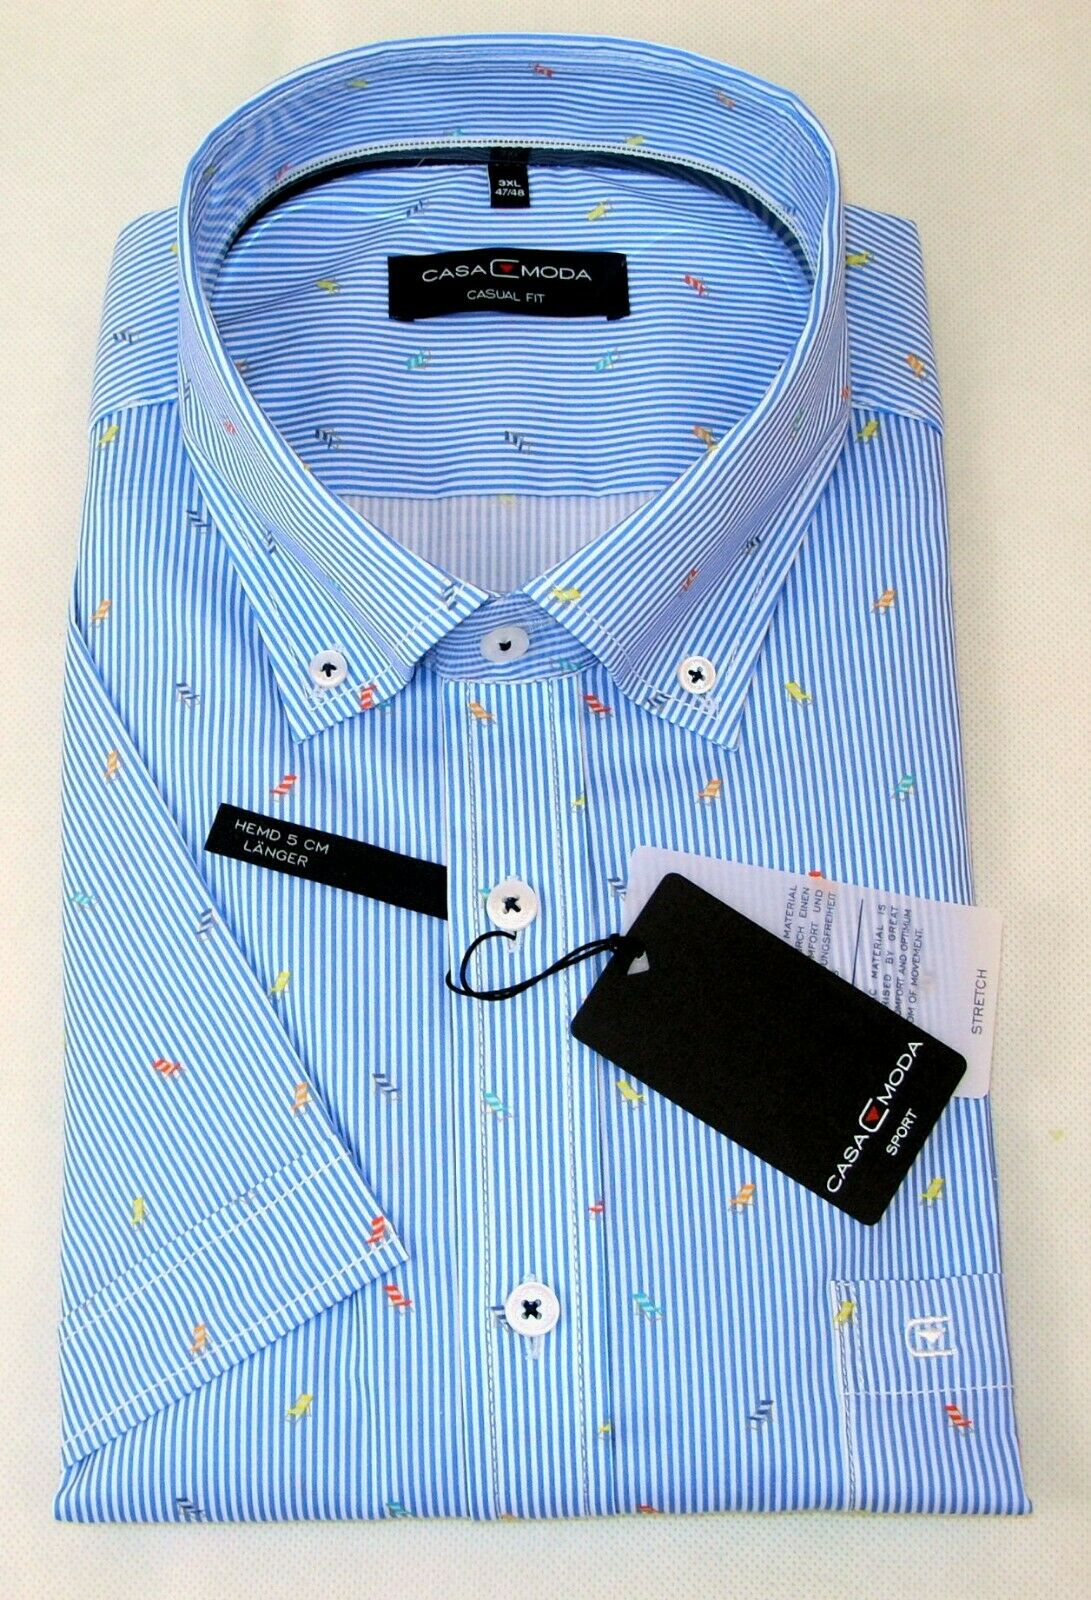 Casa Moda Uomo Camicia Casual Fit Fit Fit dimensioni a maniche corte 3xl 4xl 5xl a Strisce Nuovo 822b1f